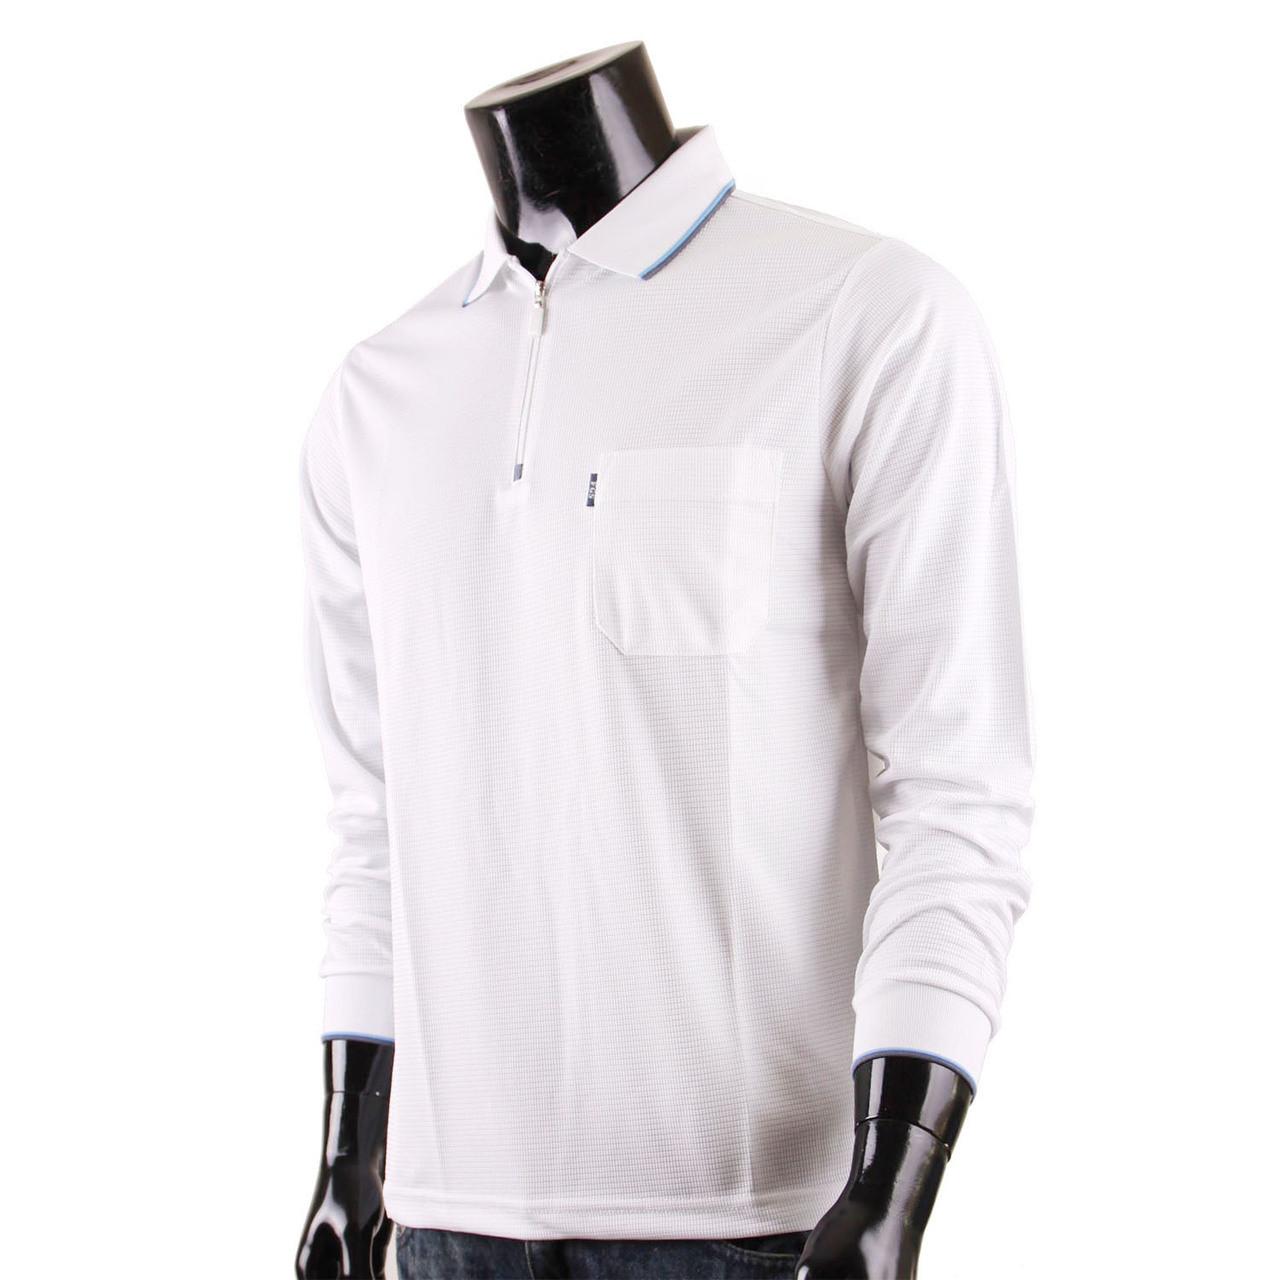 b585081c955d1 Men's Zip Polo Shirt DRI FIT Zip Polo Shirt Plain Zip Polo shirt Long  Sleeves White